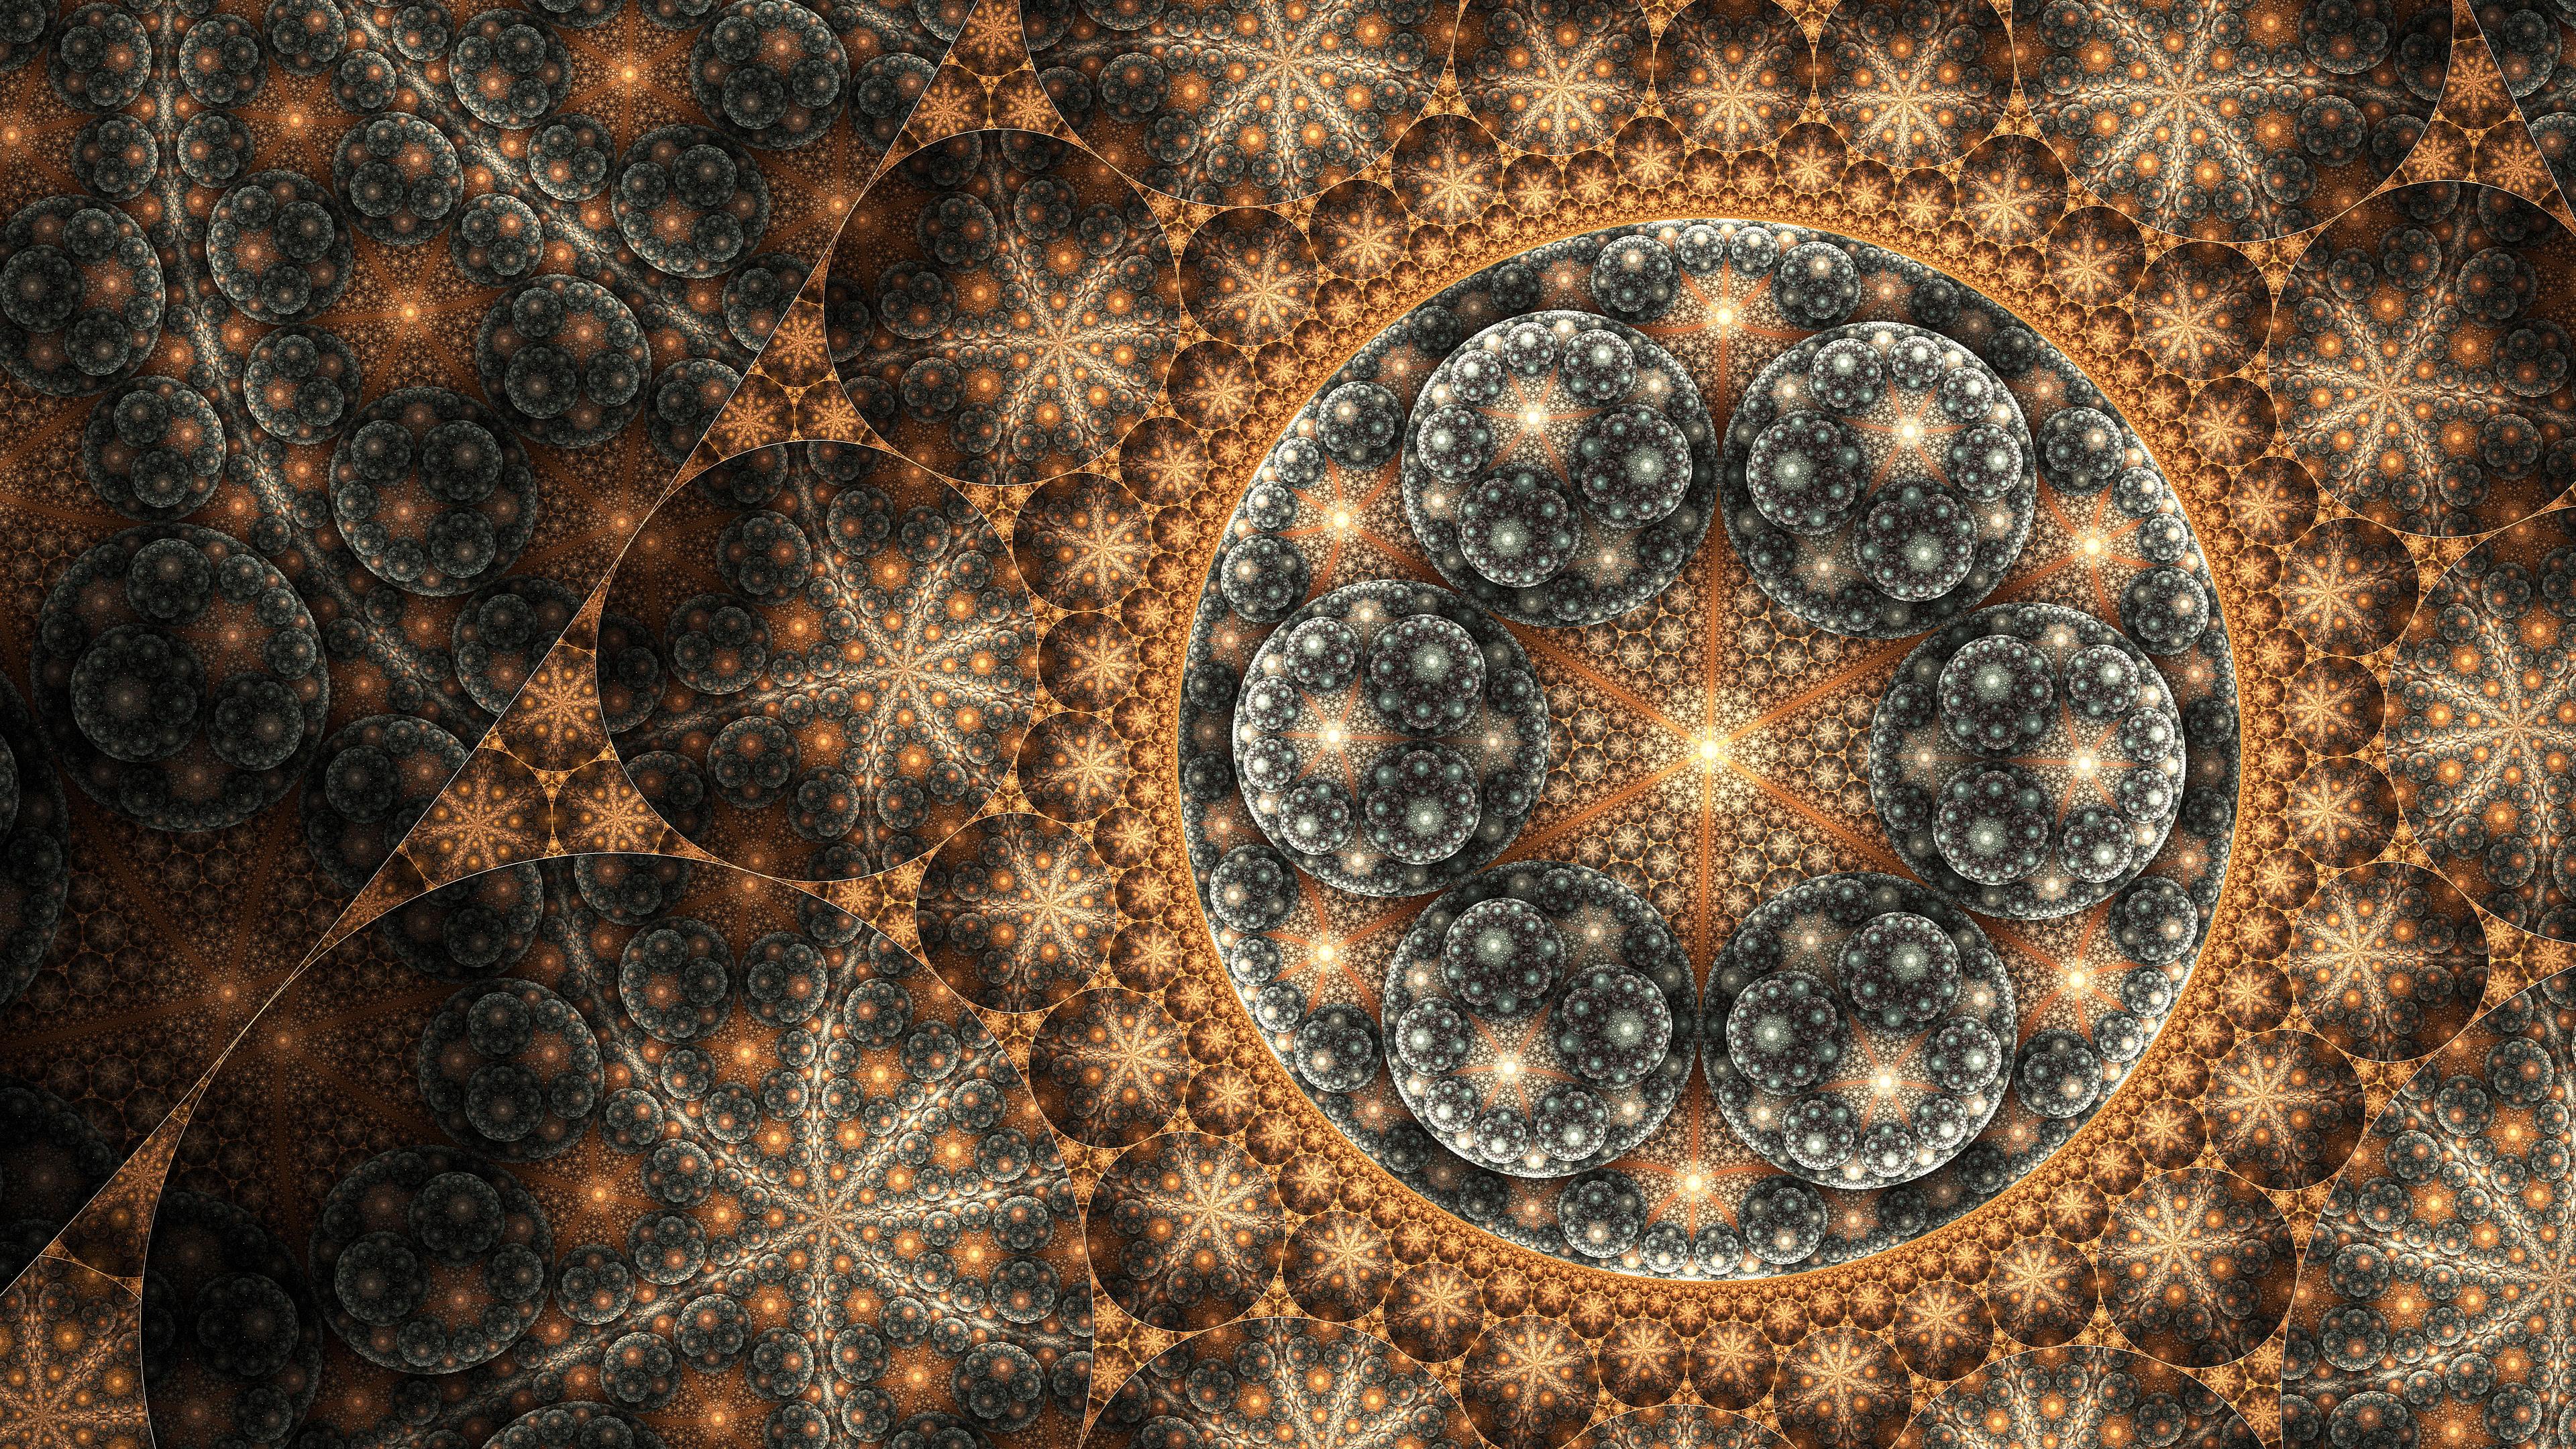 fractal art three uhd 4k wallpaper